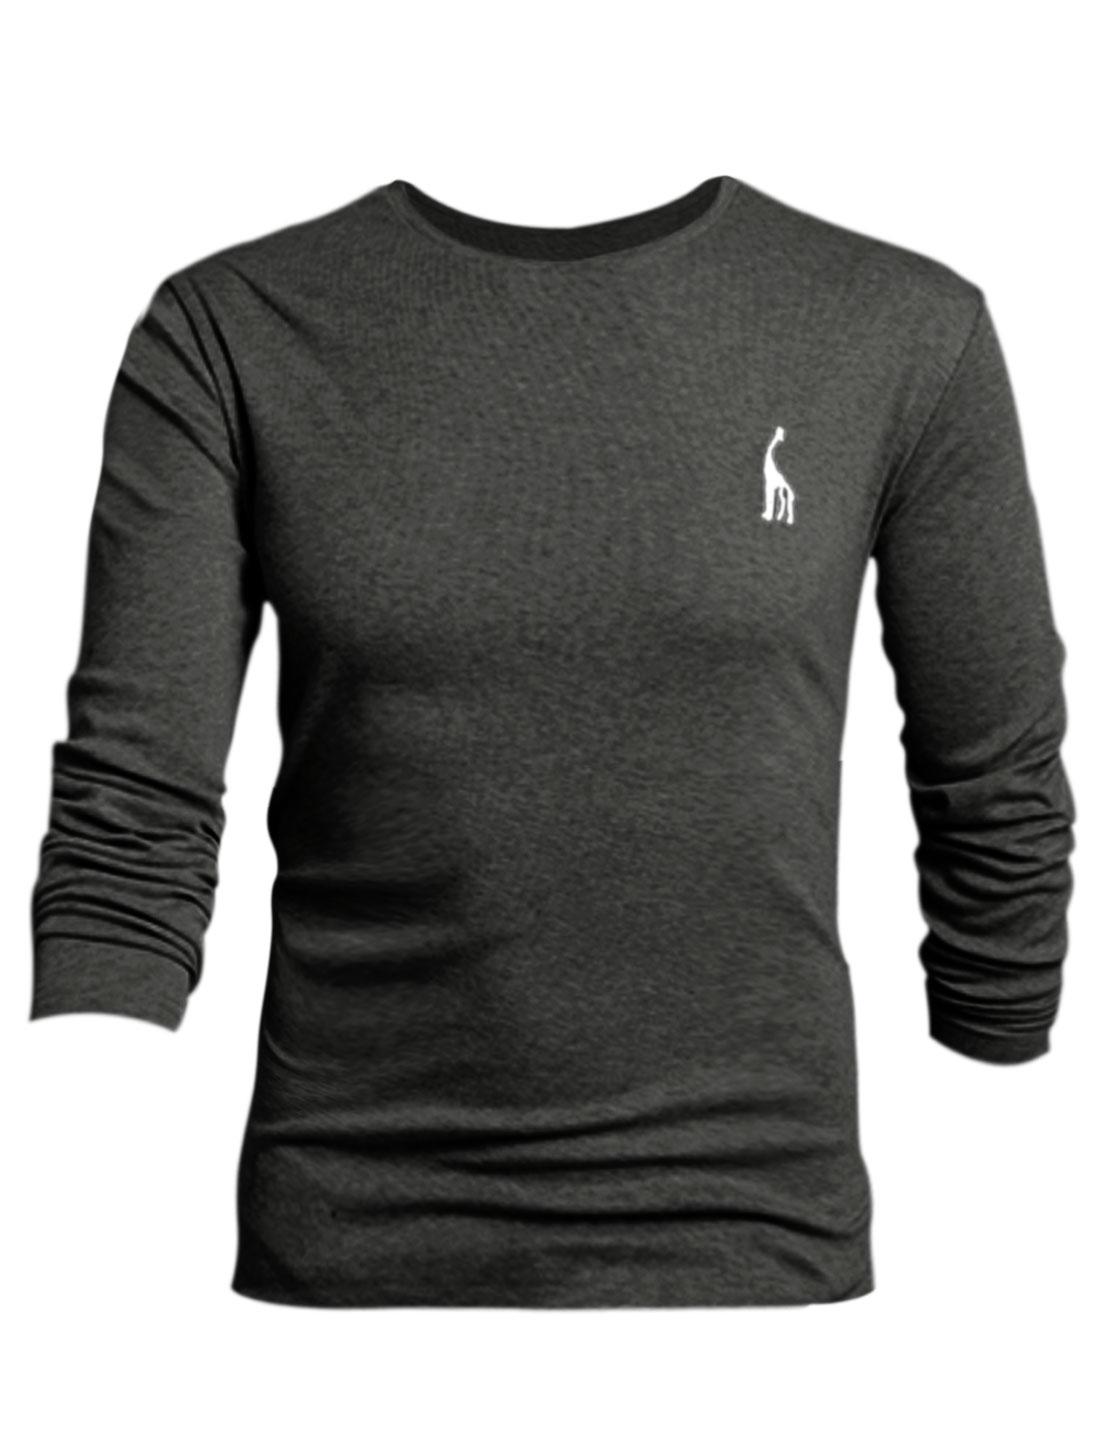 Men Number Applique Slipover Design Slim Fit Tee Shirt Dark Gray L